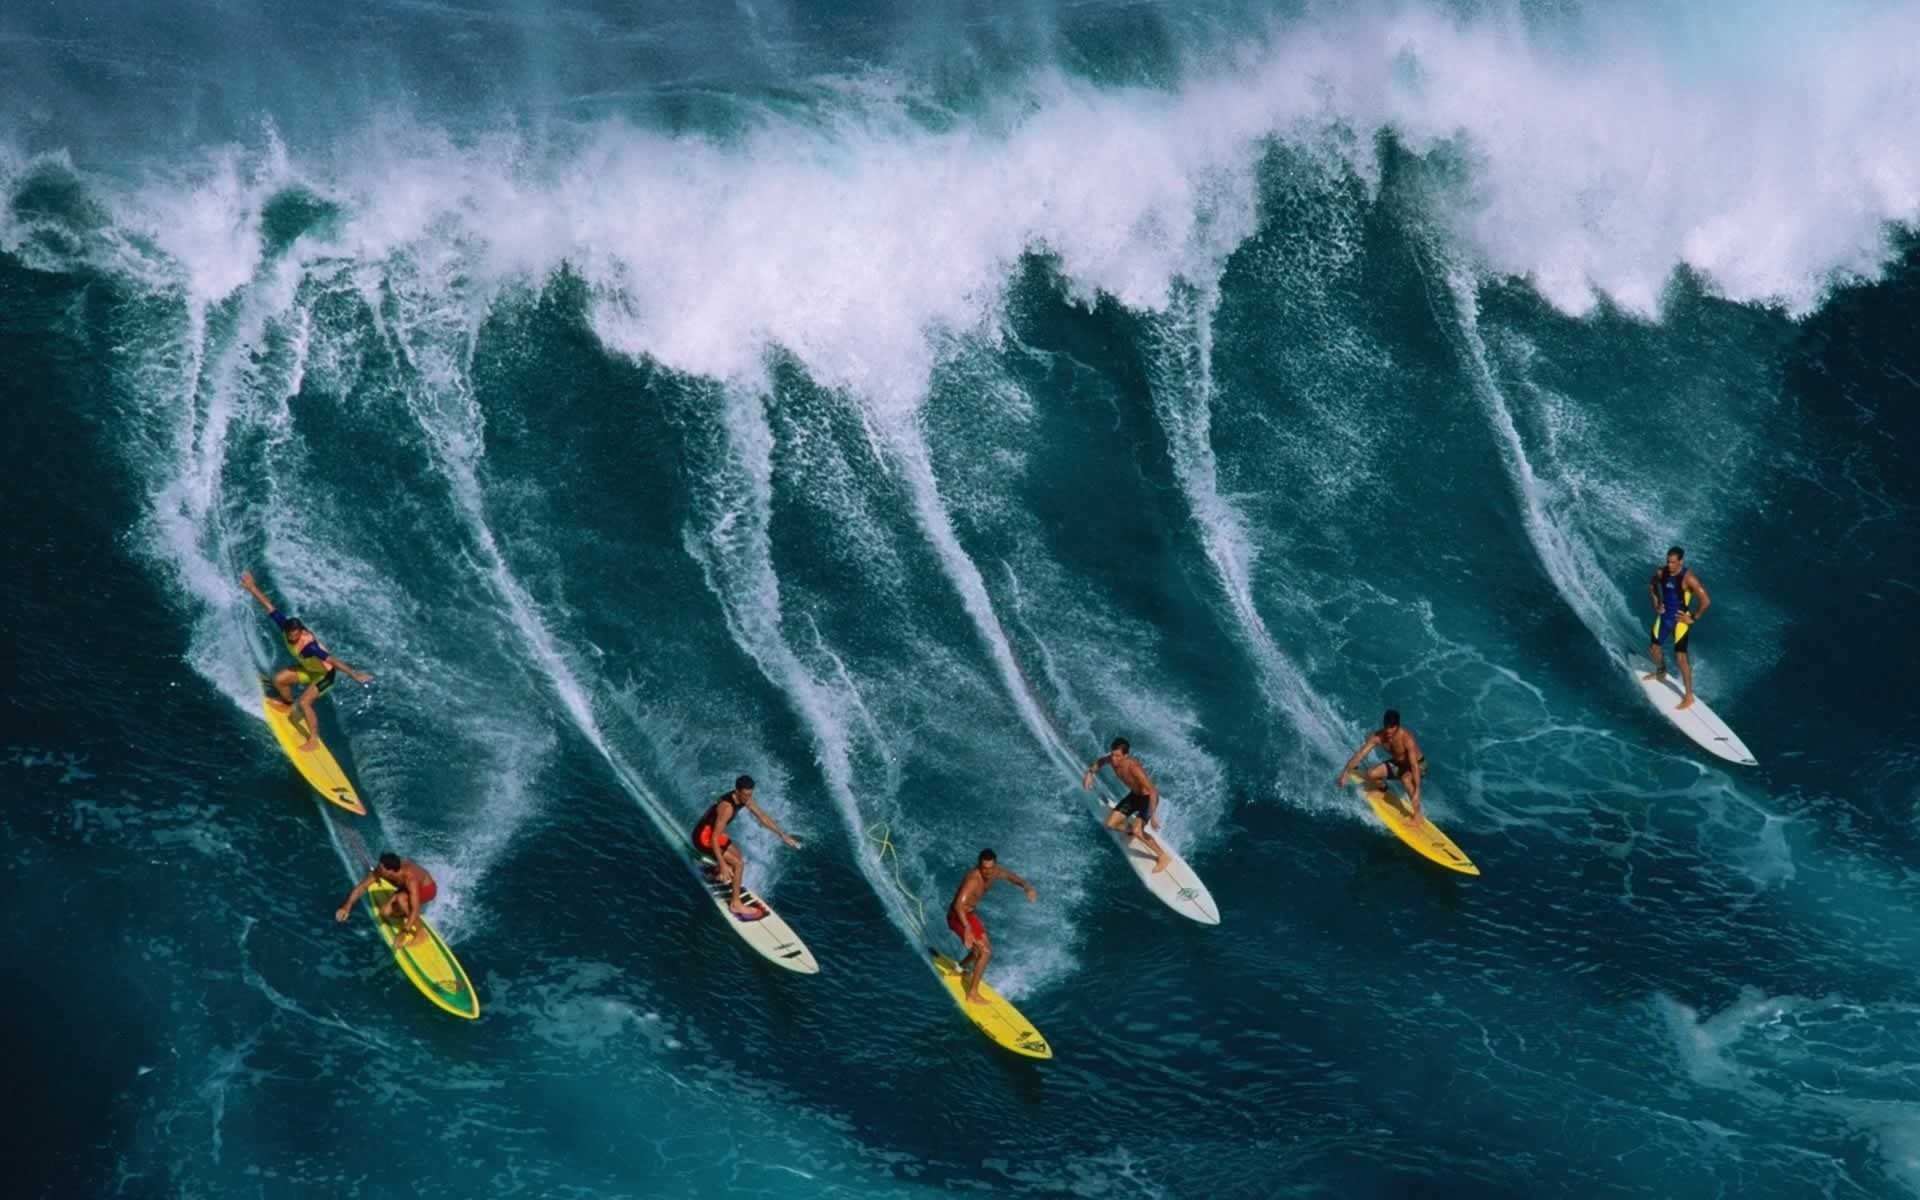 Surf Surfing Desktop Wallpaper, Surfing Pictures, New Wallpapers